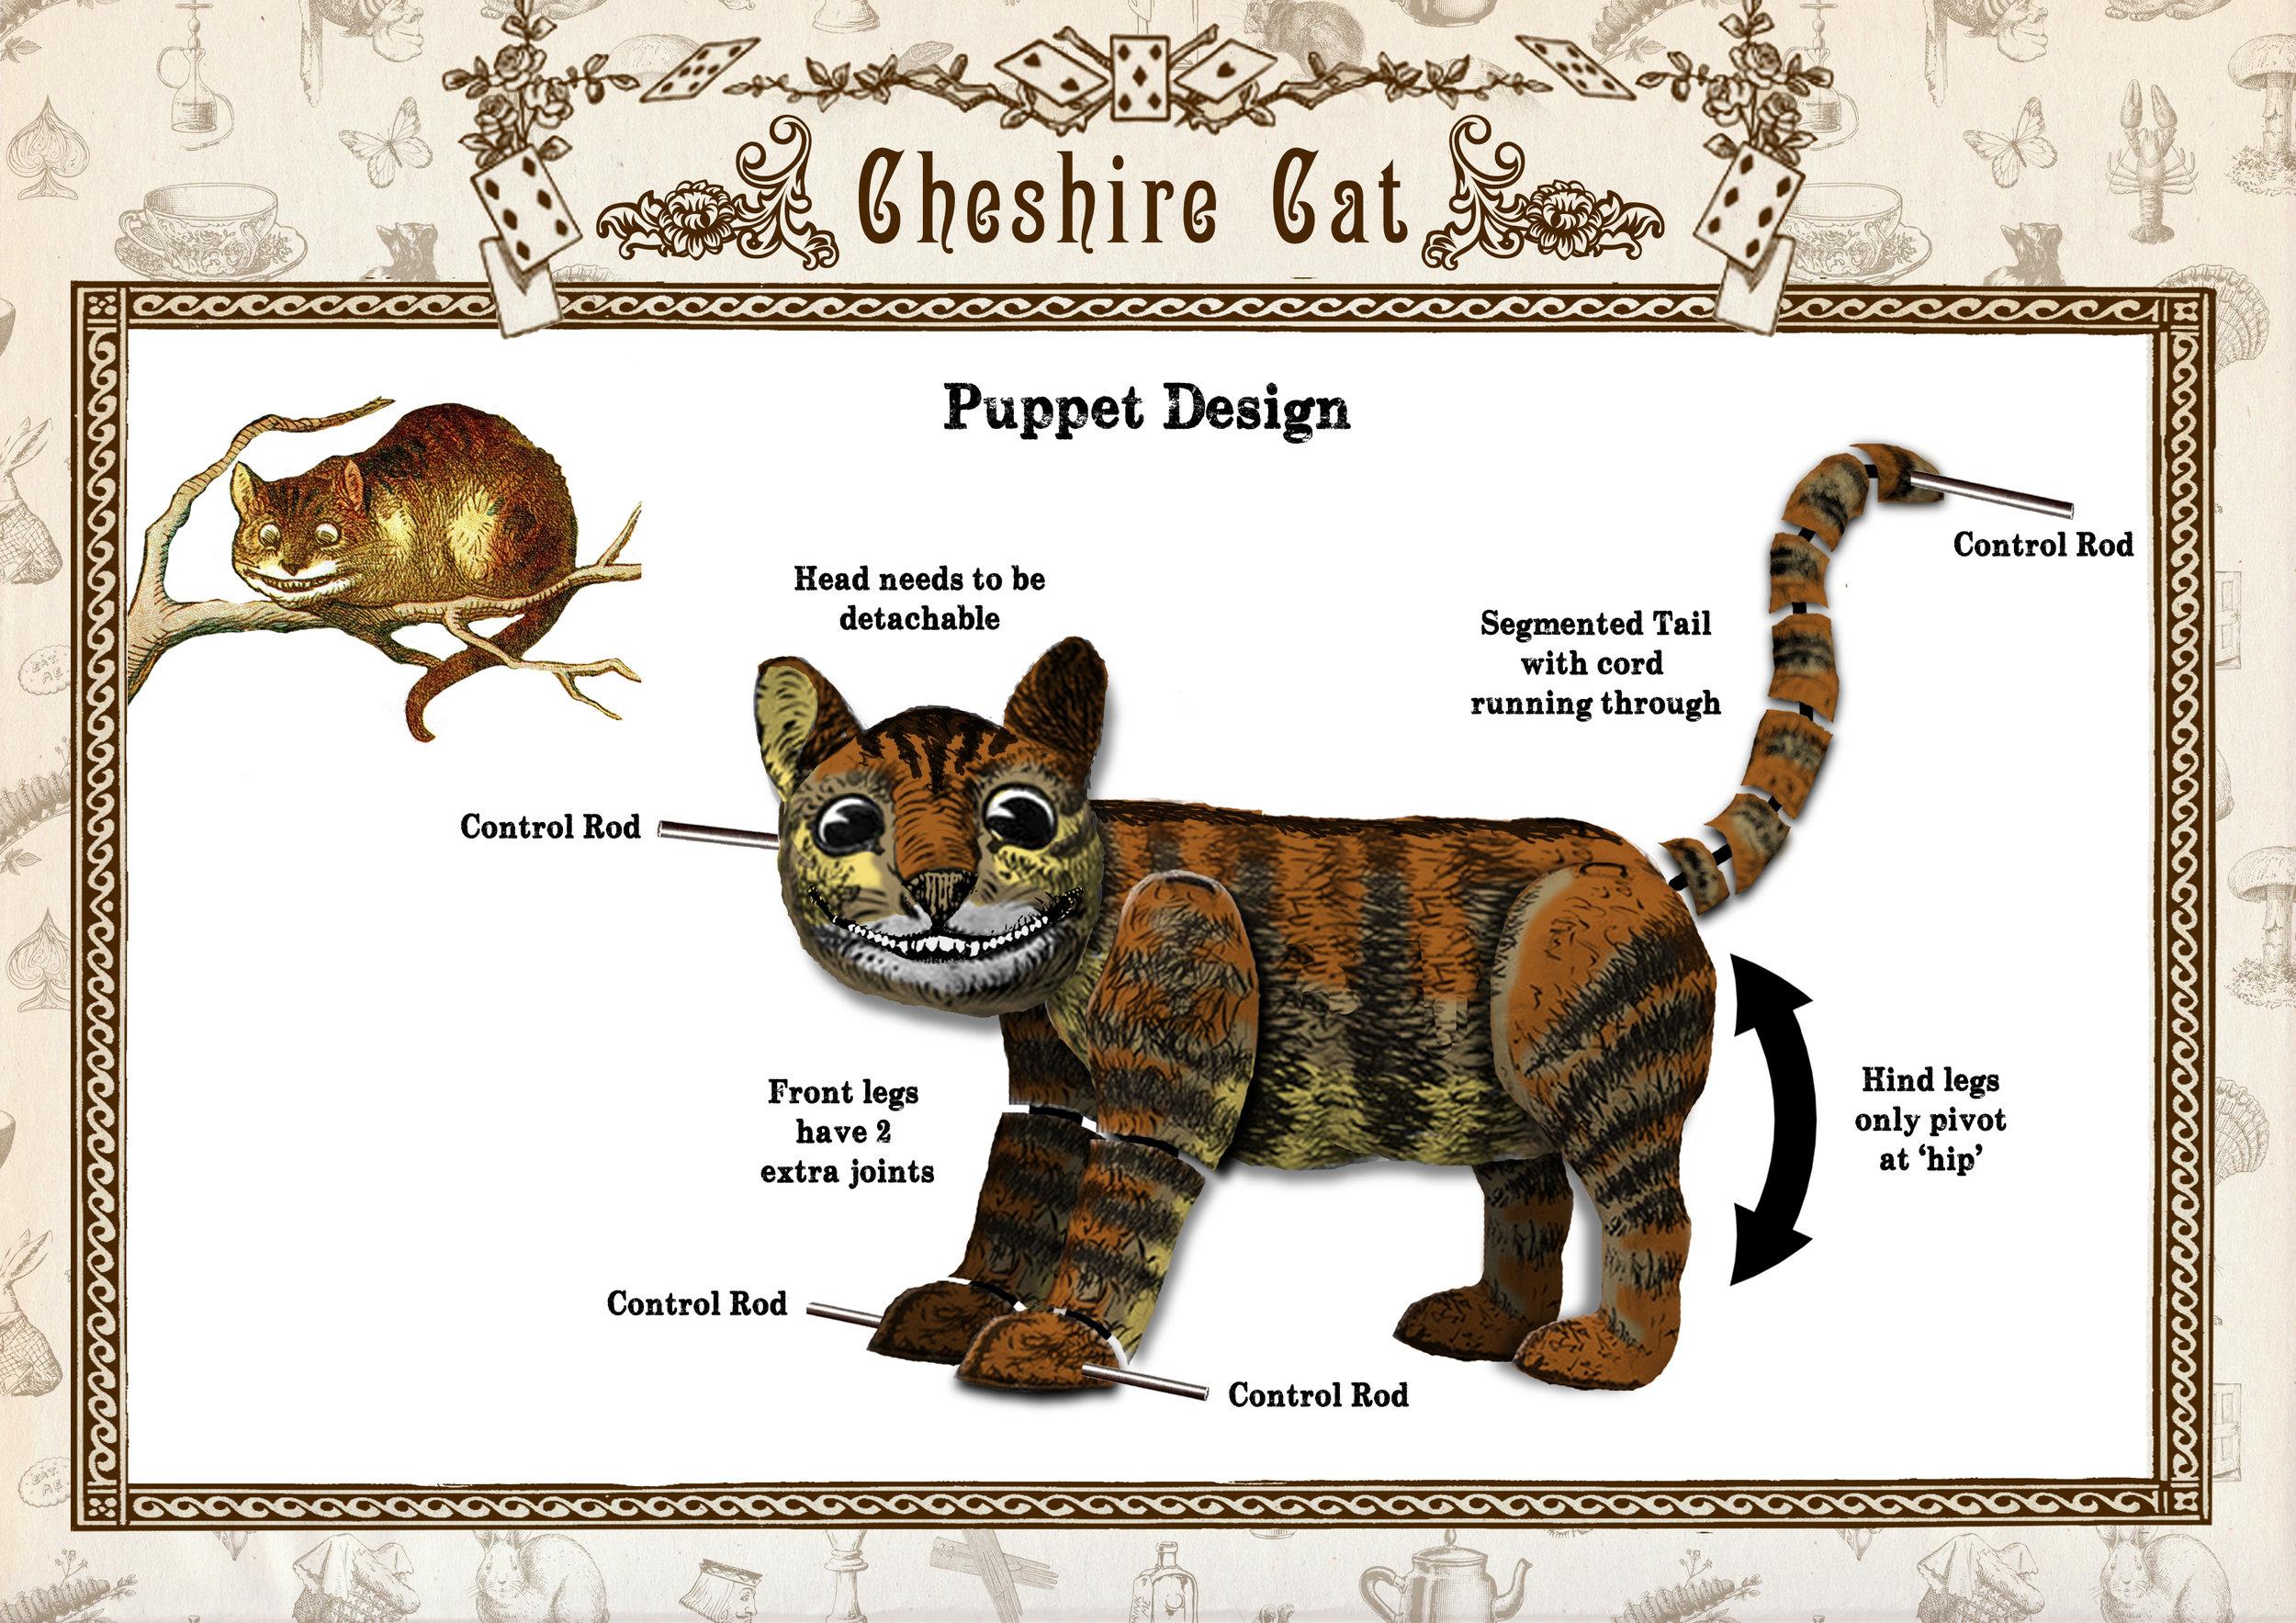 Cheshire Cat Puppet Design.jpg